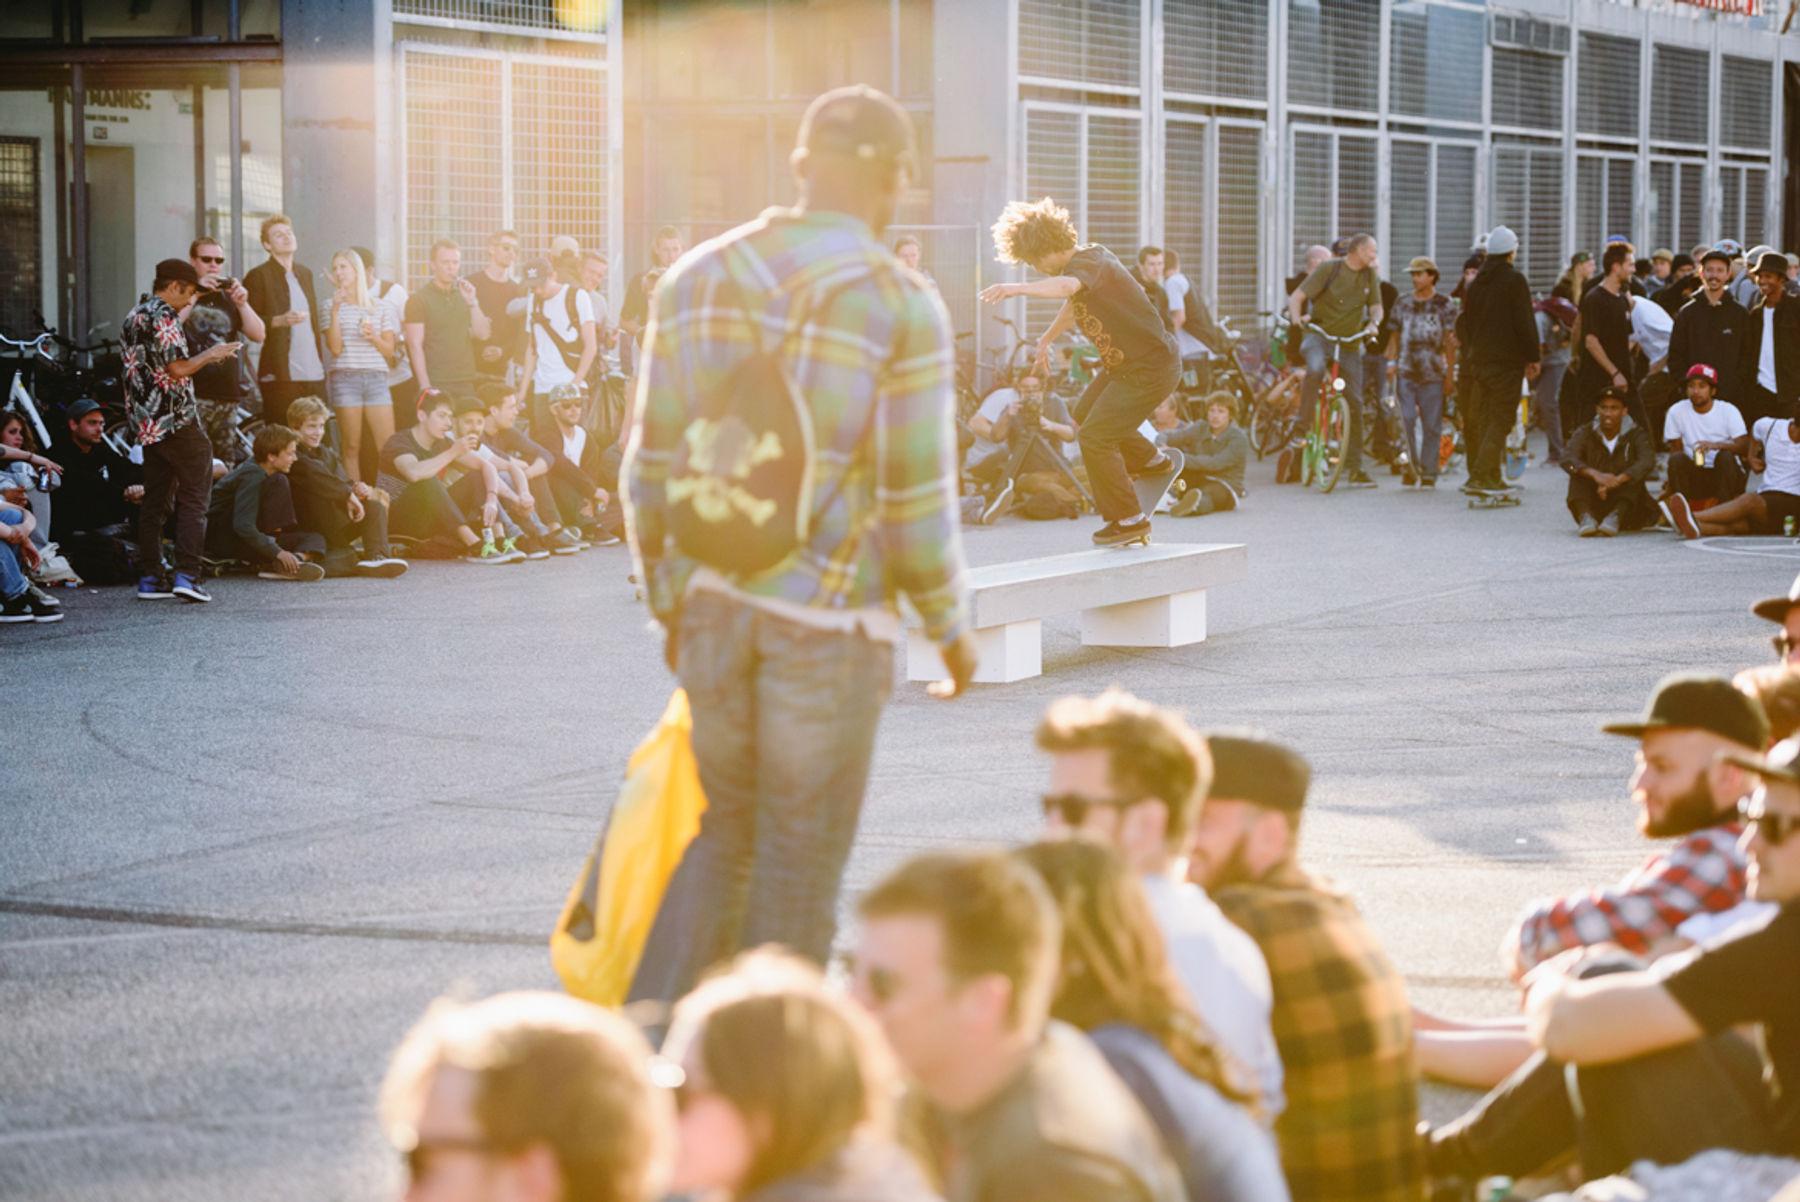 _IHC4091e-Nassim-Guammaz-Fs-180-Switch-Bs-5-0-Nike-SB-Copenhagen-Open-Ledges-Meat-Packing-District-Day-2-July-2015-Photographer-Maksim-Kalanep